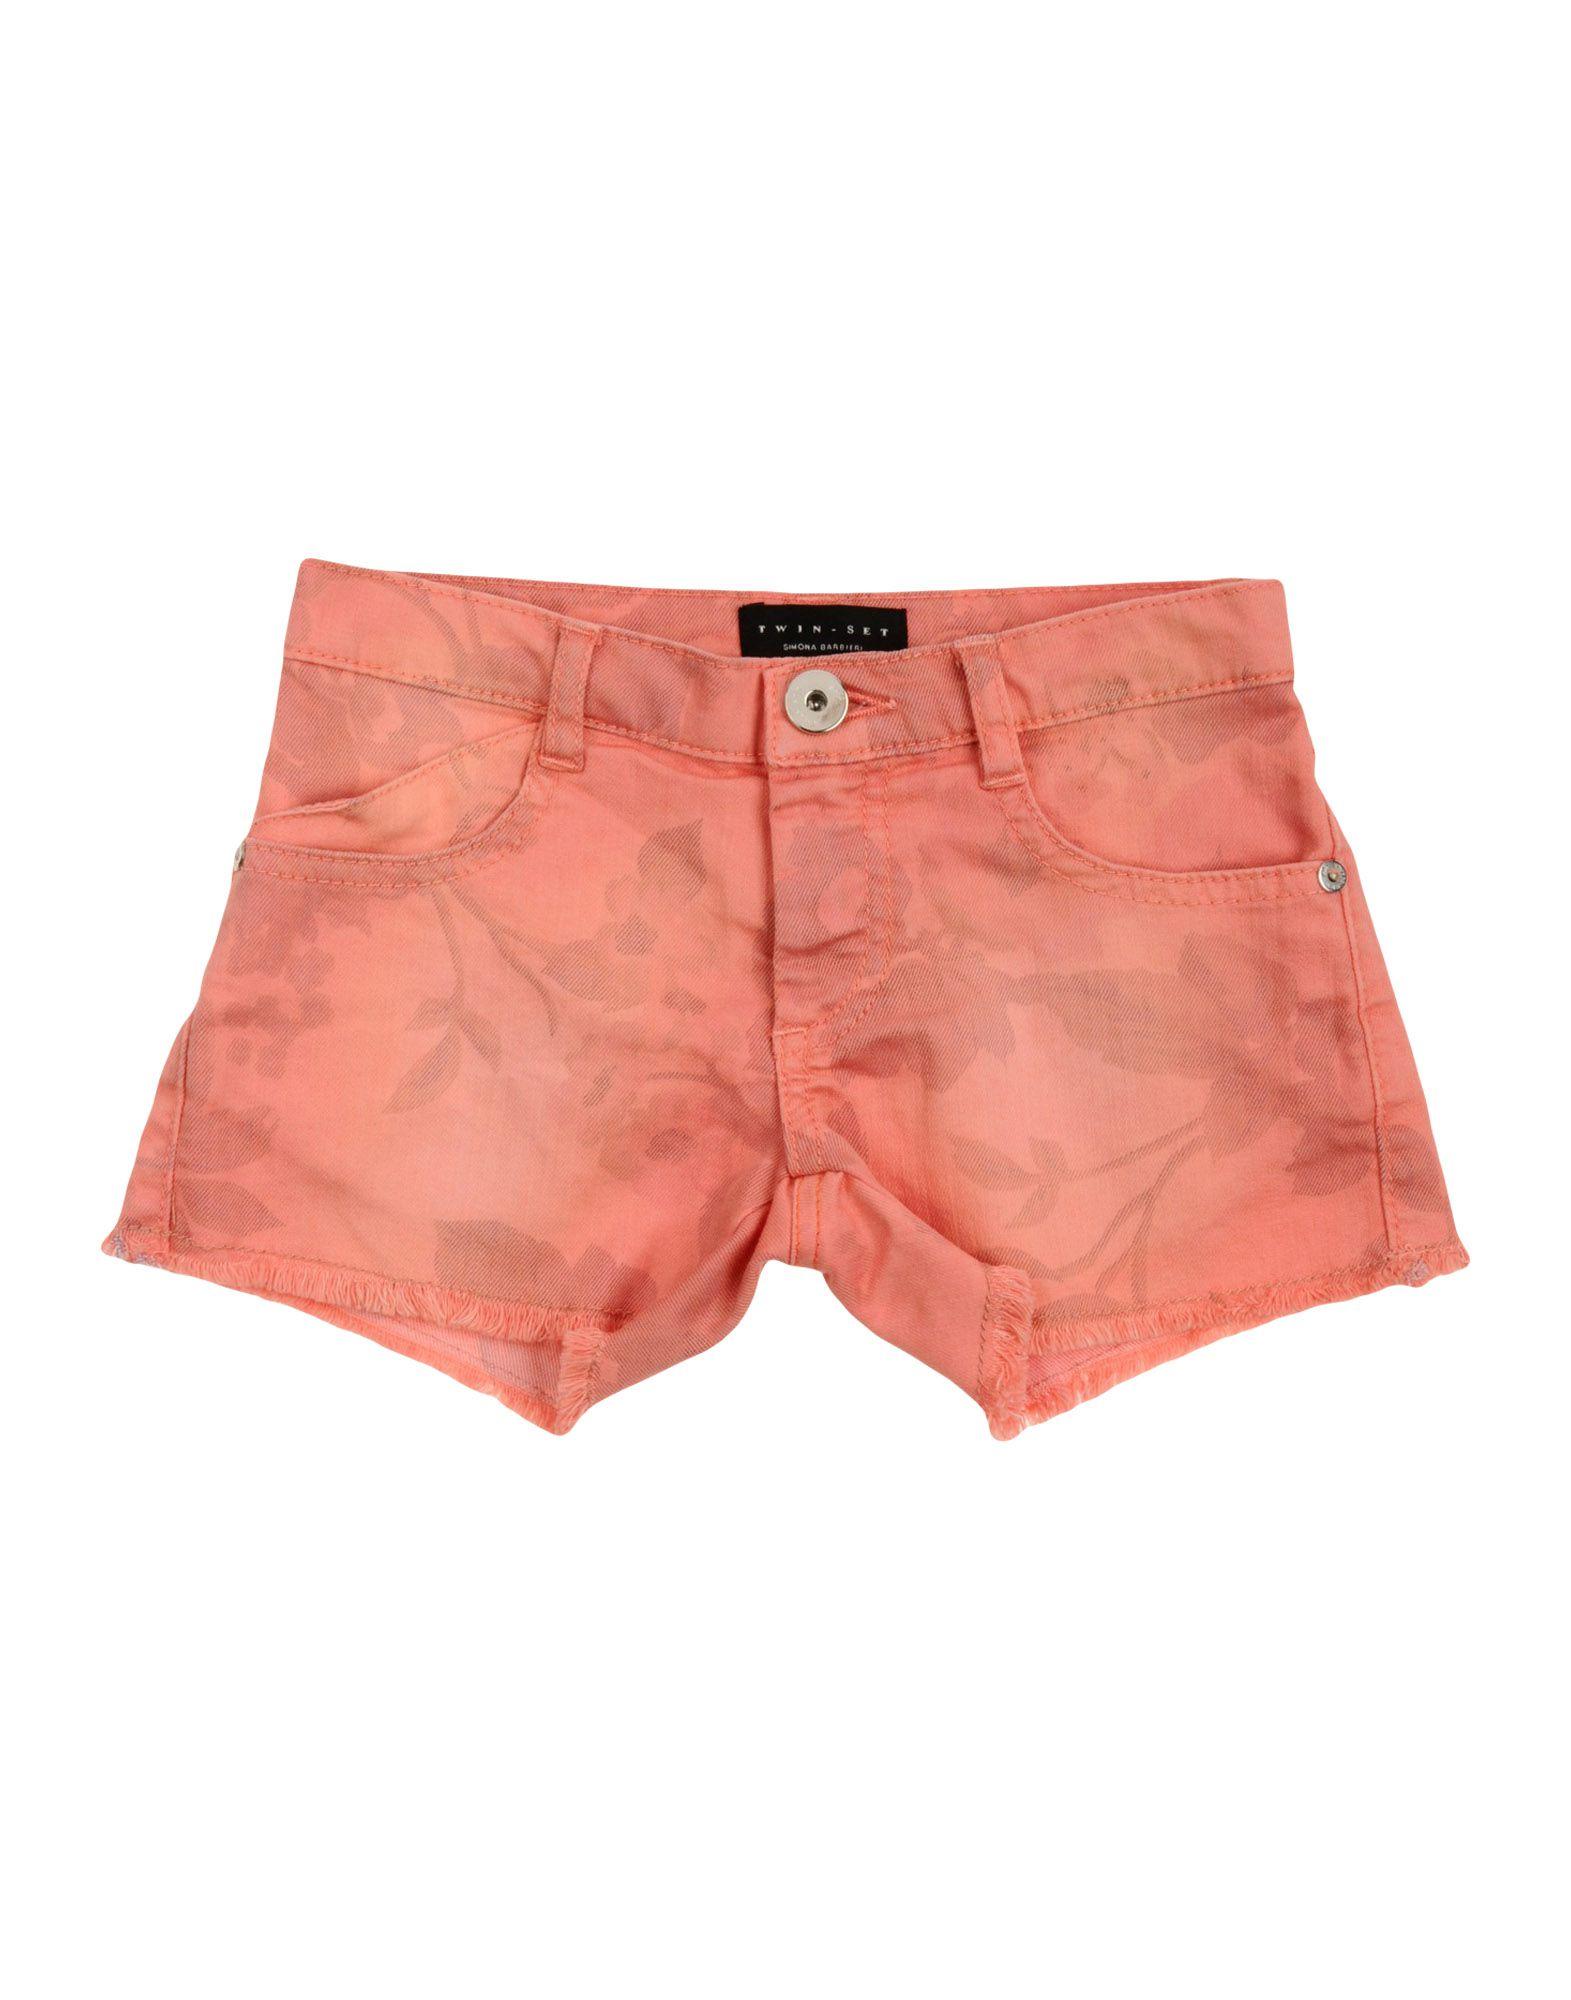 TWINSET | TWINSET Denim shorts 42654430 | Goxip